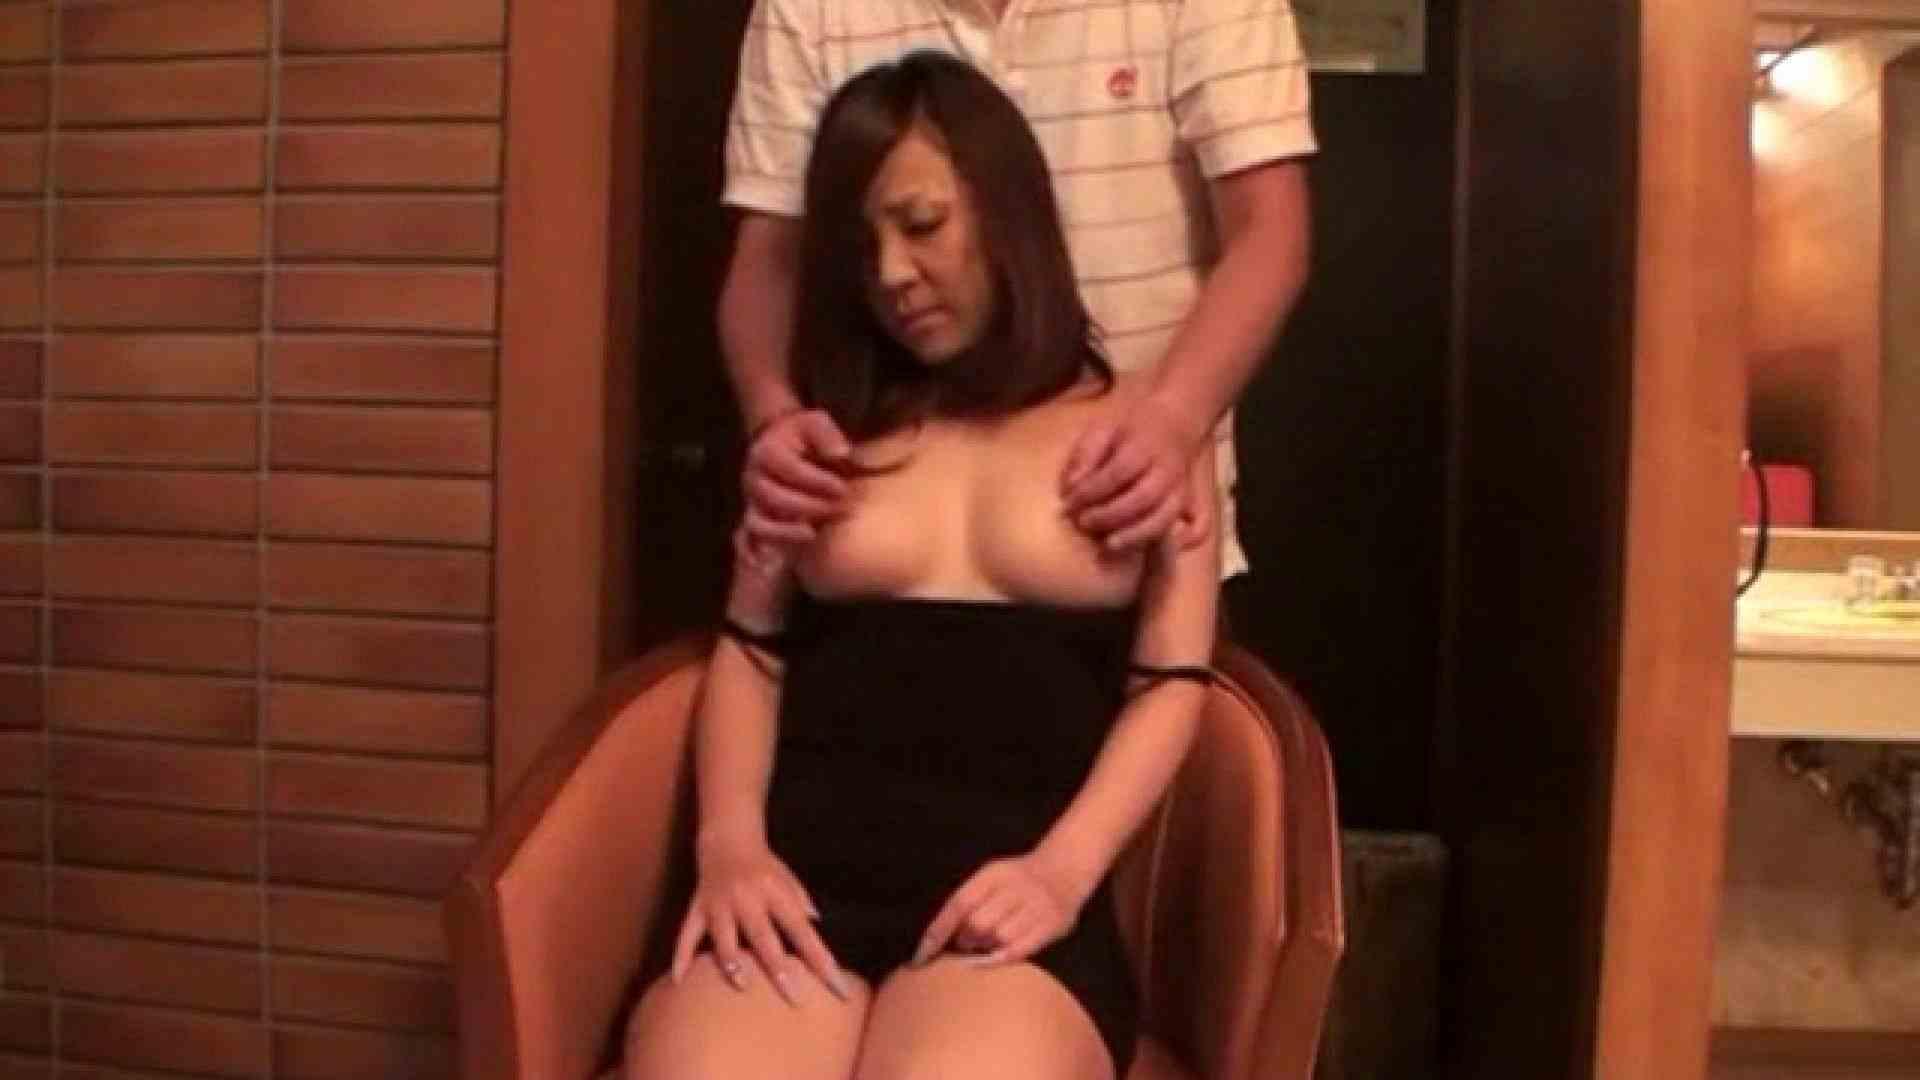 S級厳選美女ビッチガールVol.10 美女OL 盗撮動画紹介 45連発 2